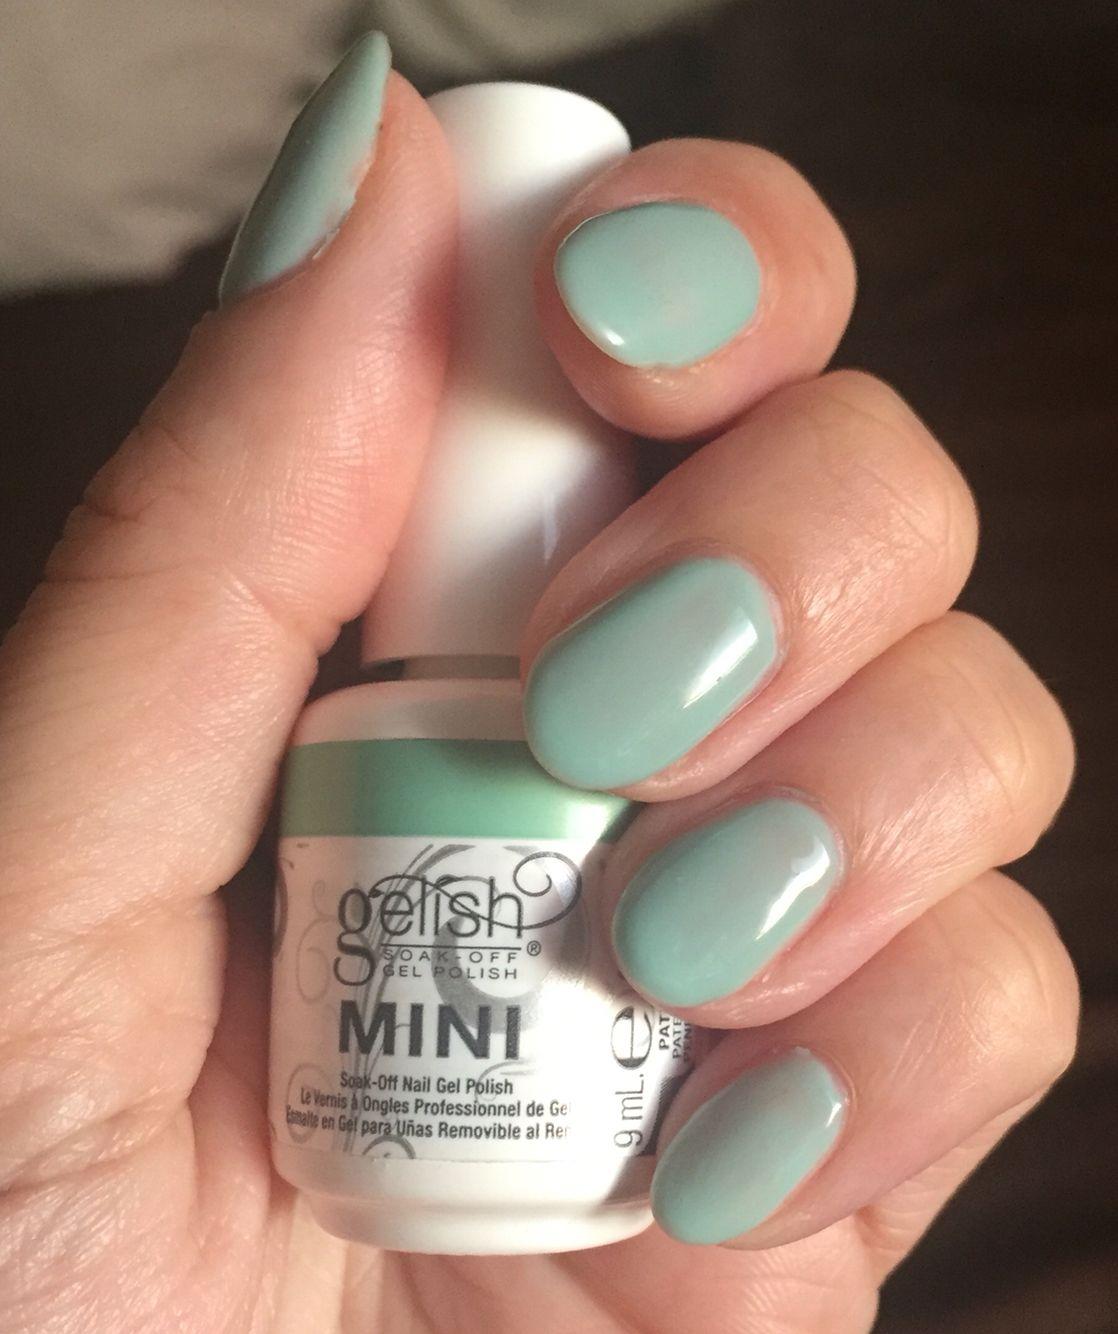 Gelish Sea Foam Gel Nail Polish Gel Nail Polish Set Gel Manicure Nails